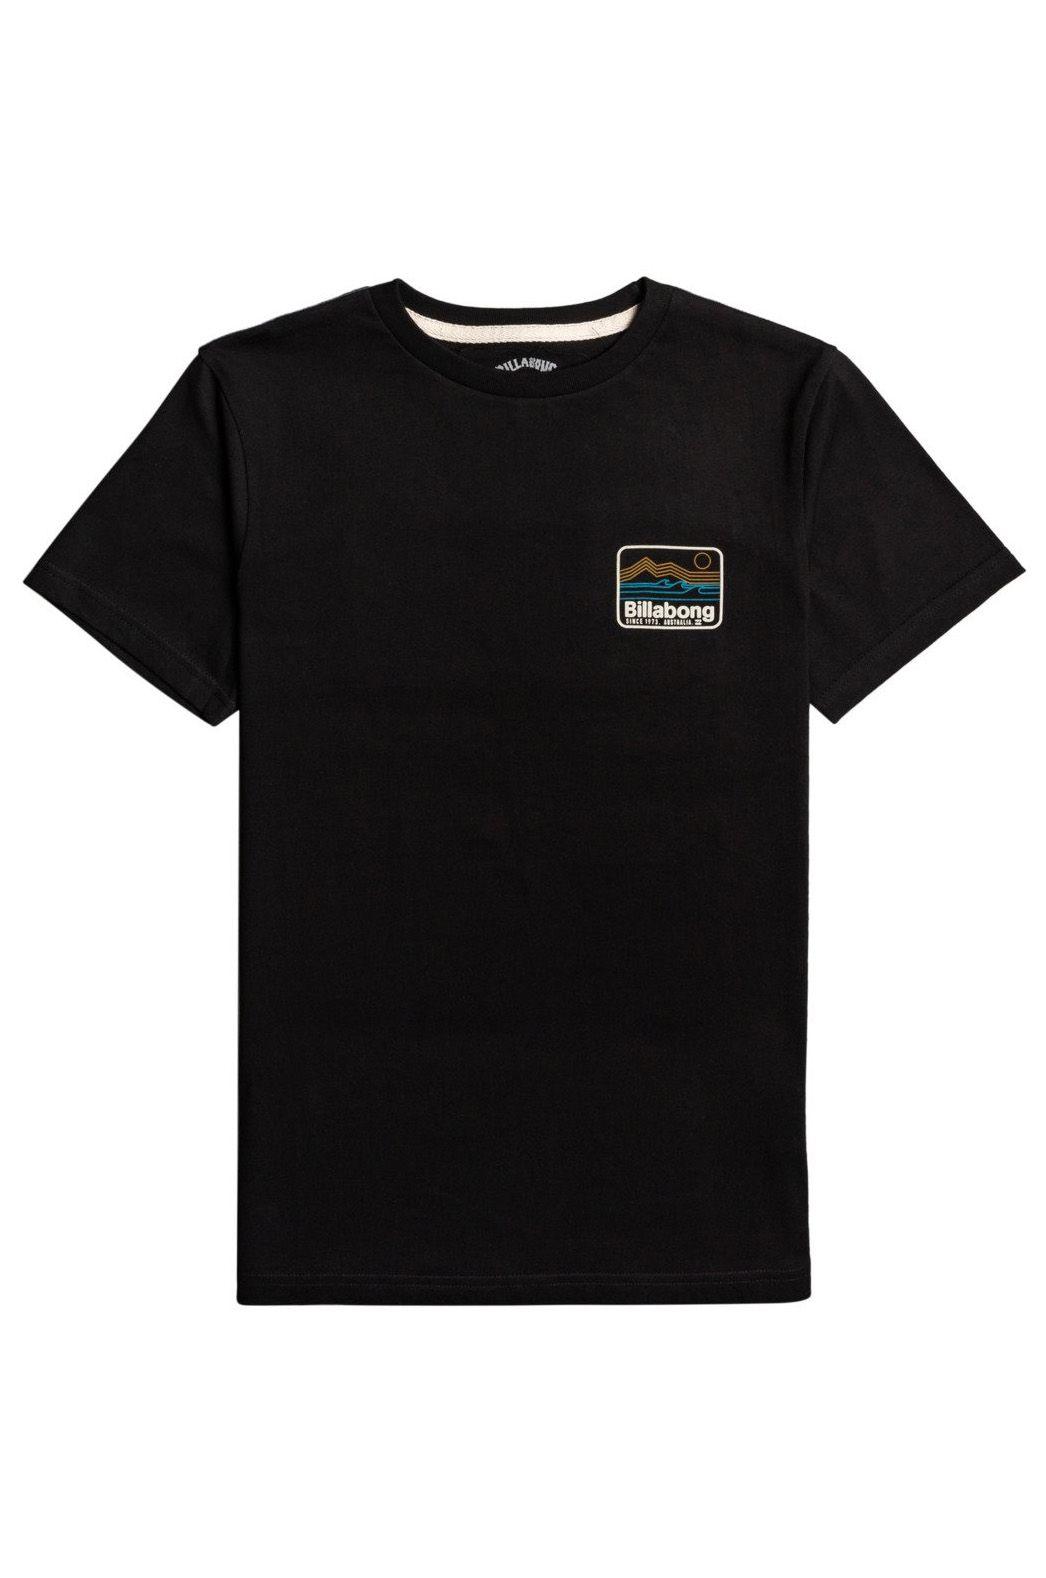 Billabong T-Shirt DREAM COAST SS BOY SPORTING GOOD PROGR. Black